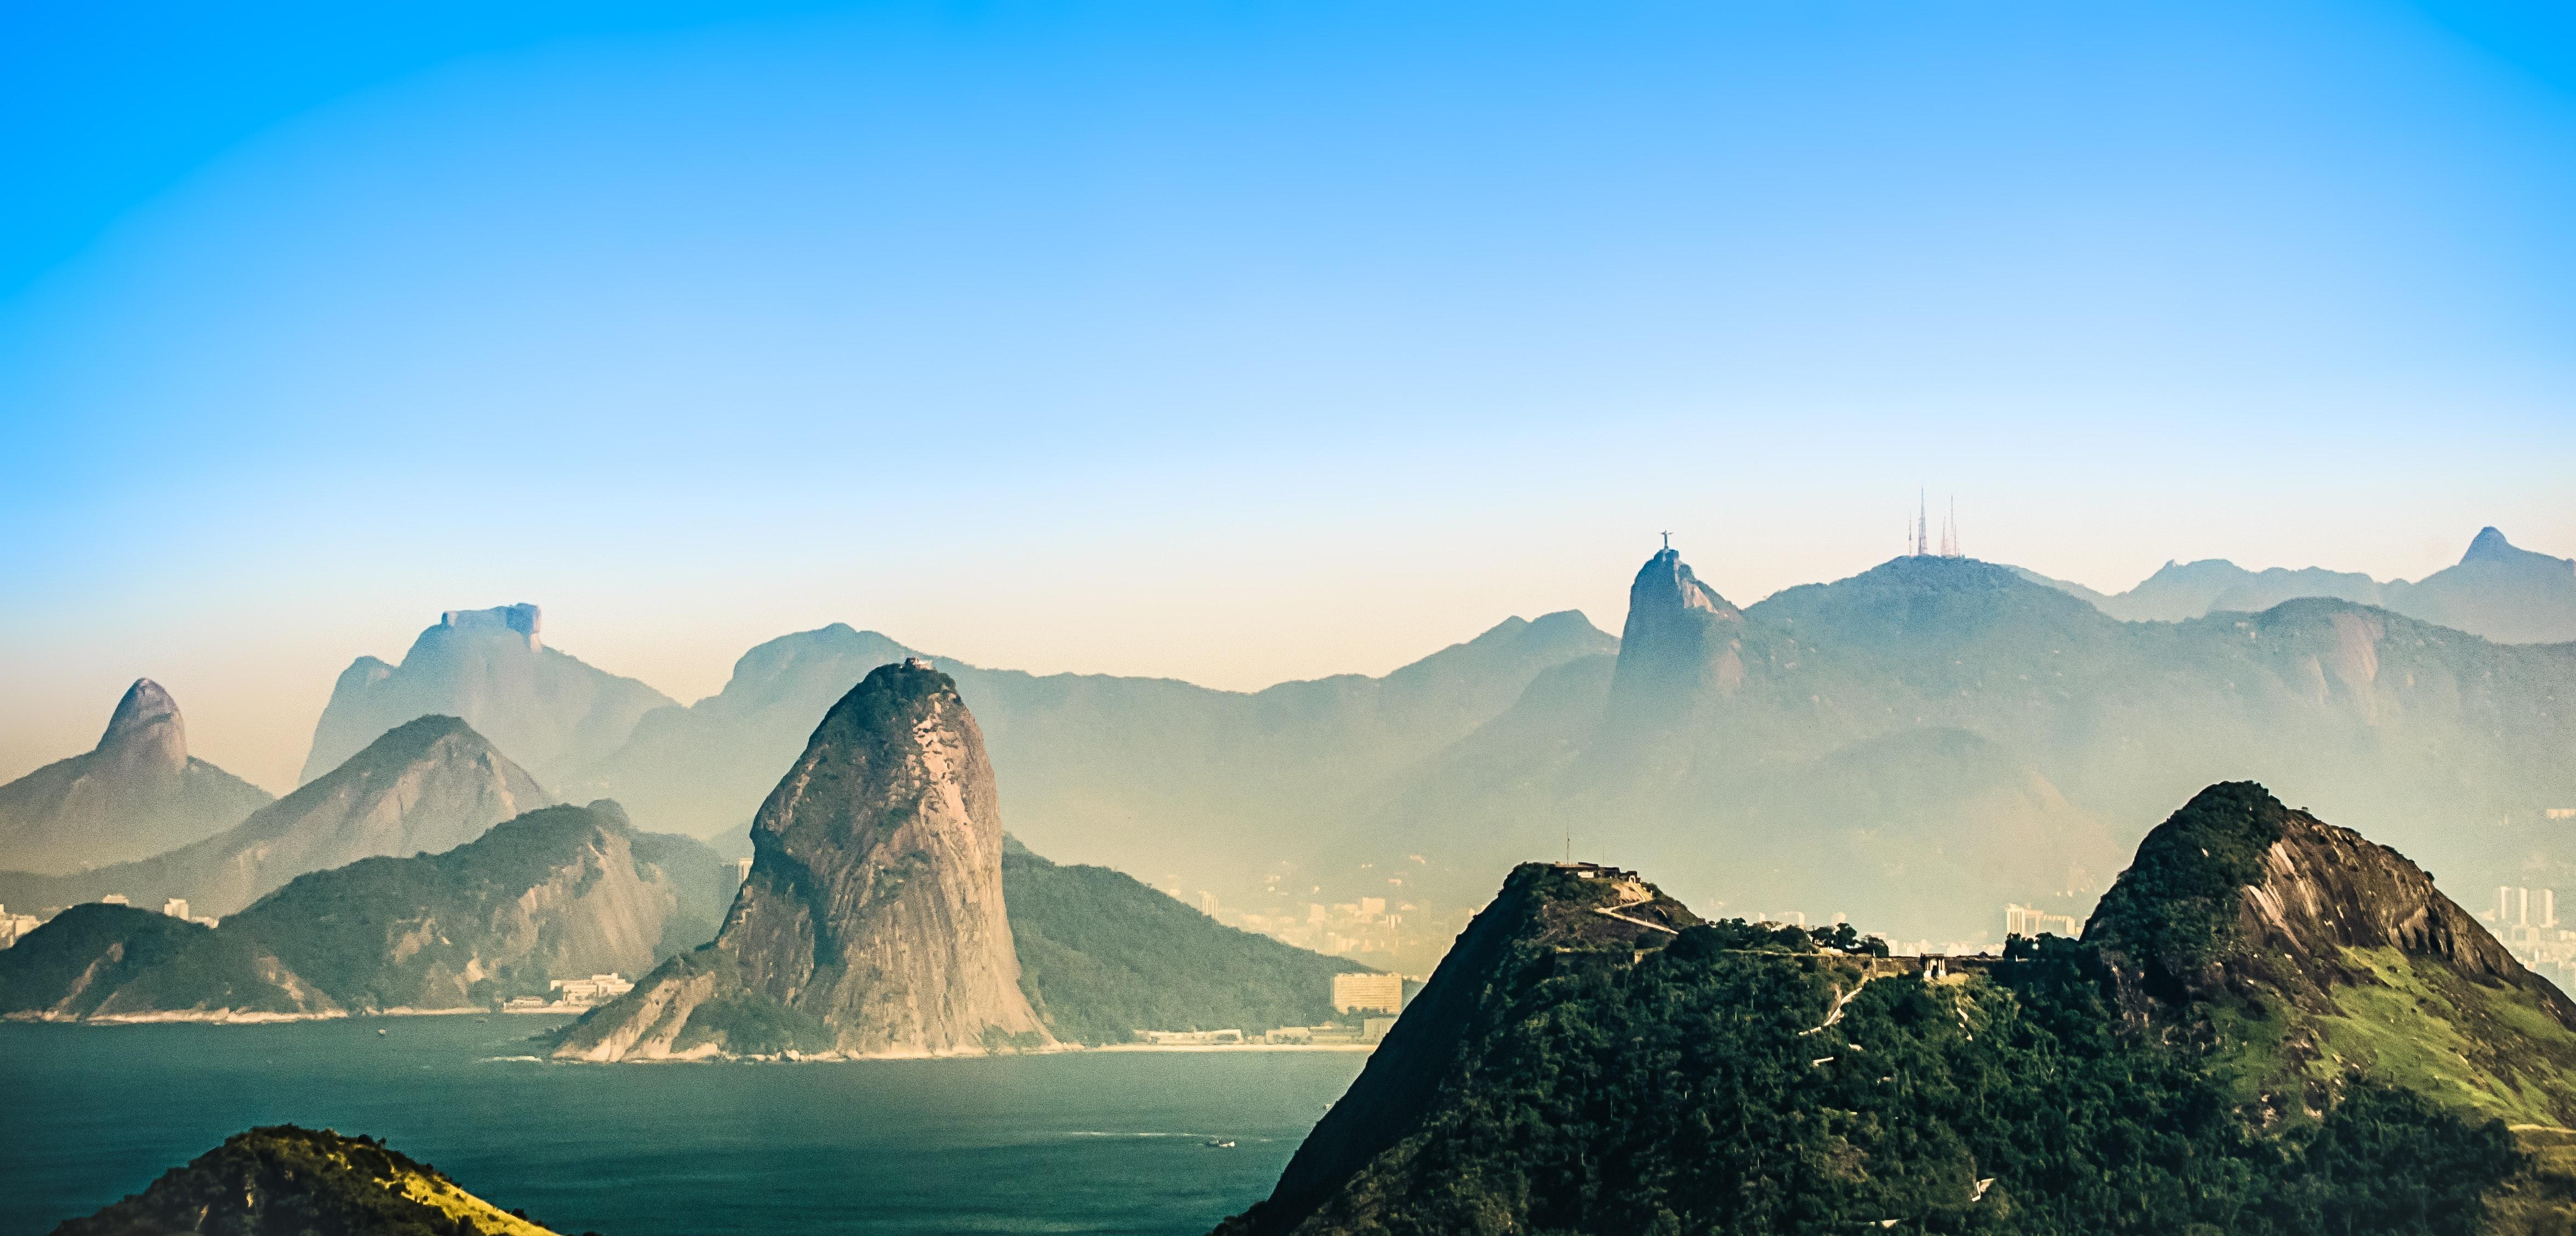 Fog Covered Mountains during Daytime, Scenic, Rocks, Rio de janeiro, Sea, HQ Photo